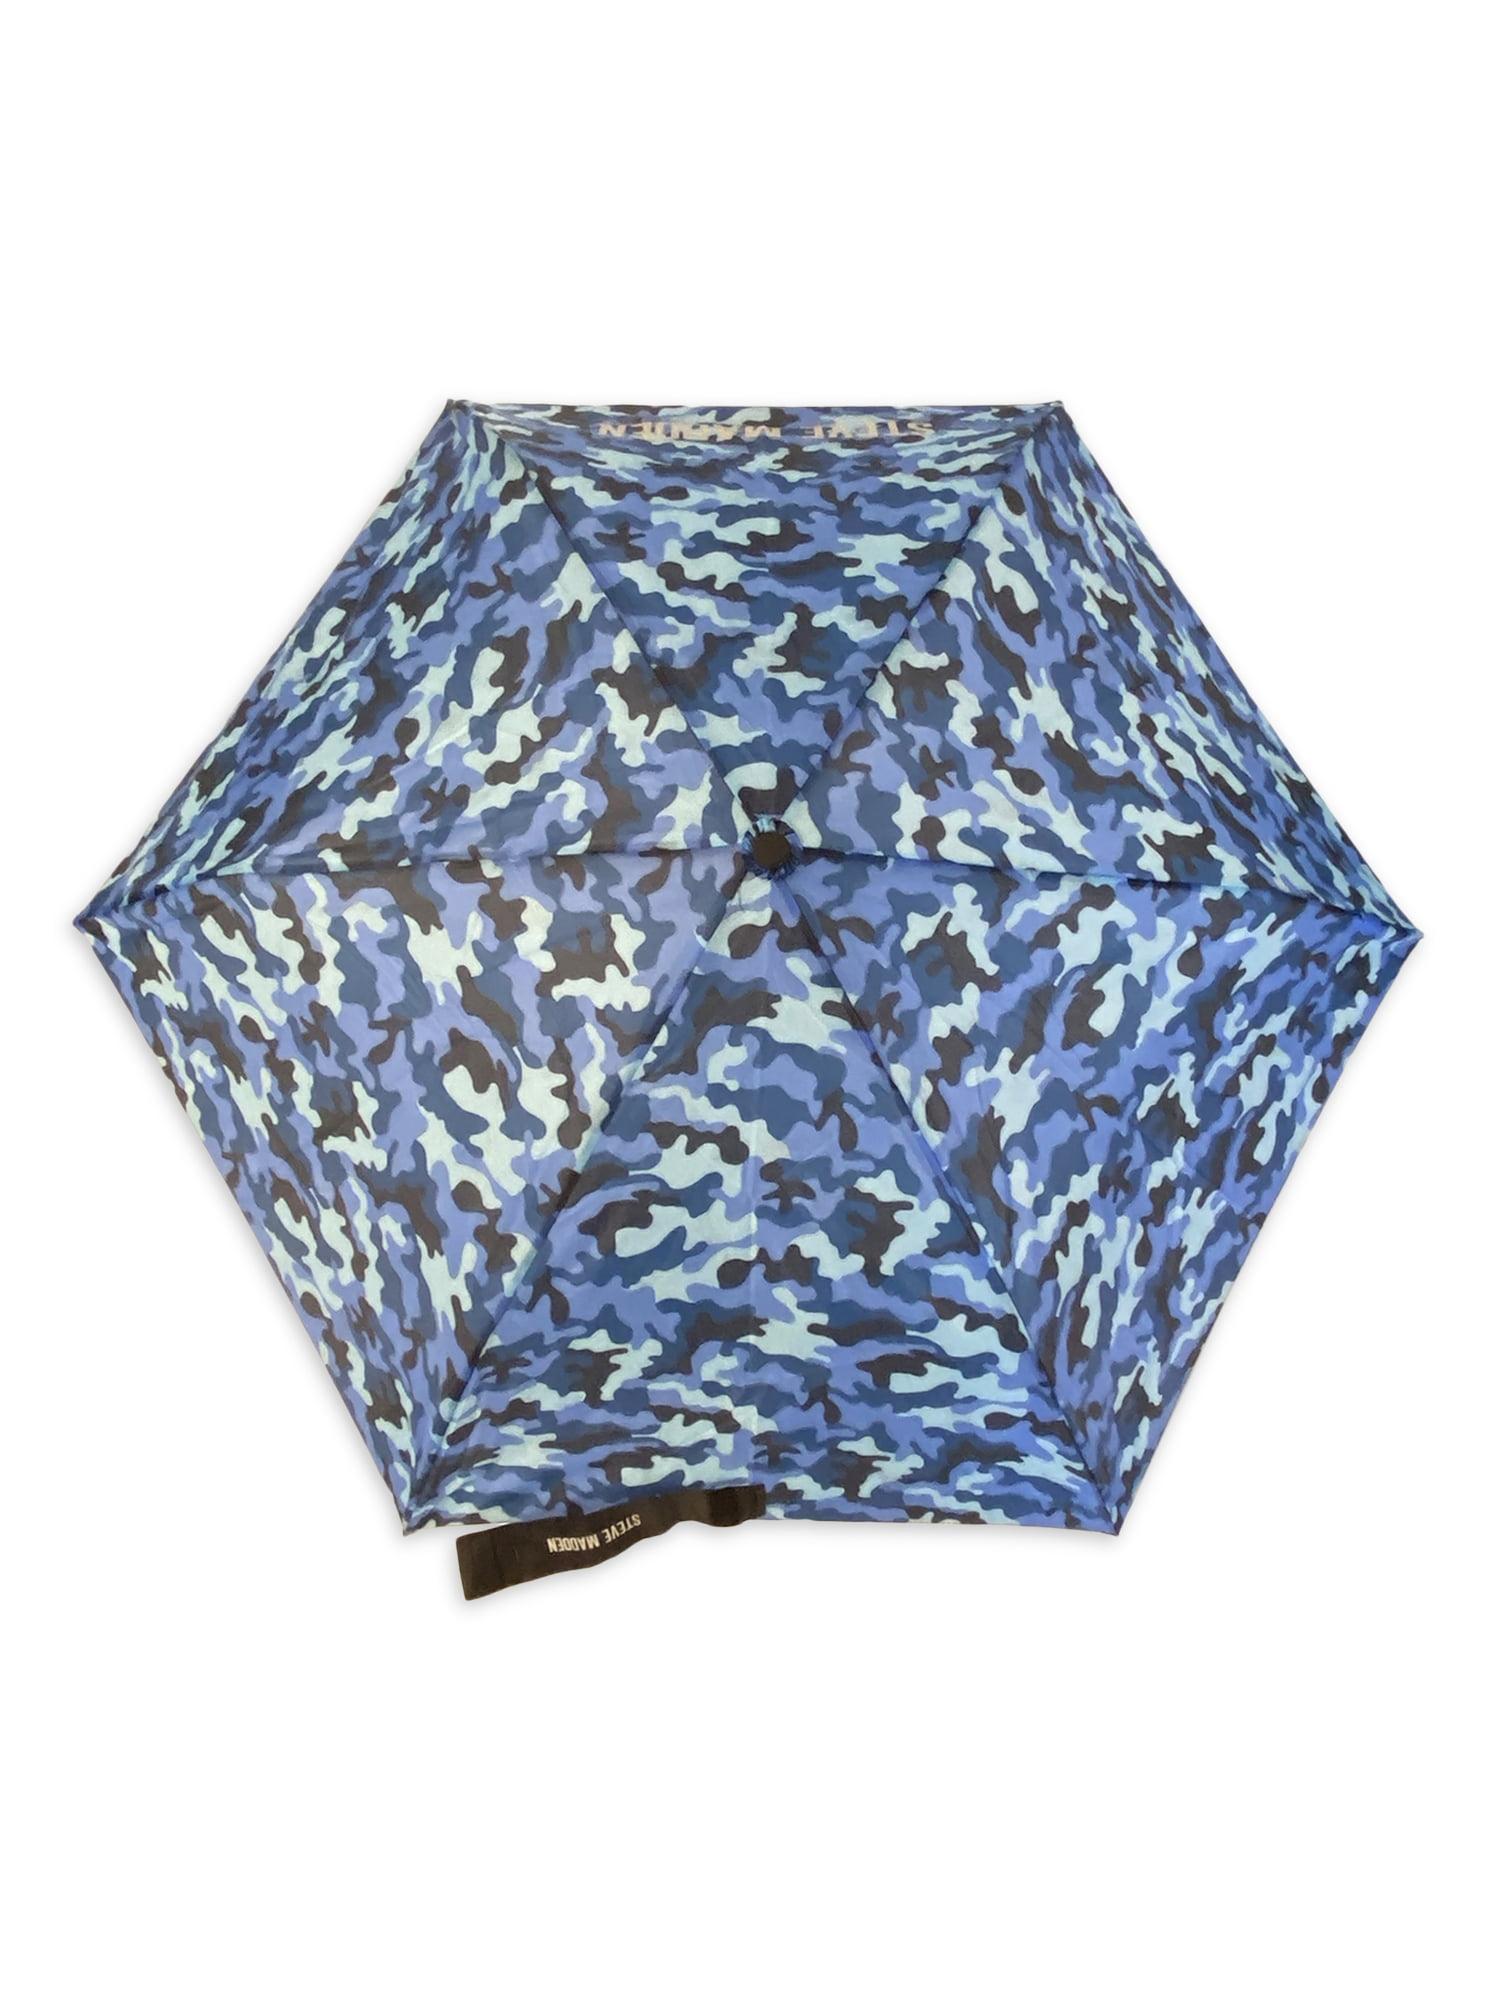 Cheyan Folding Umbrella Windproof Rainproof Portable Lightweight Travel Compact Custom Manual Bubbles Group